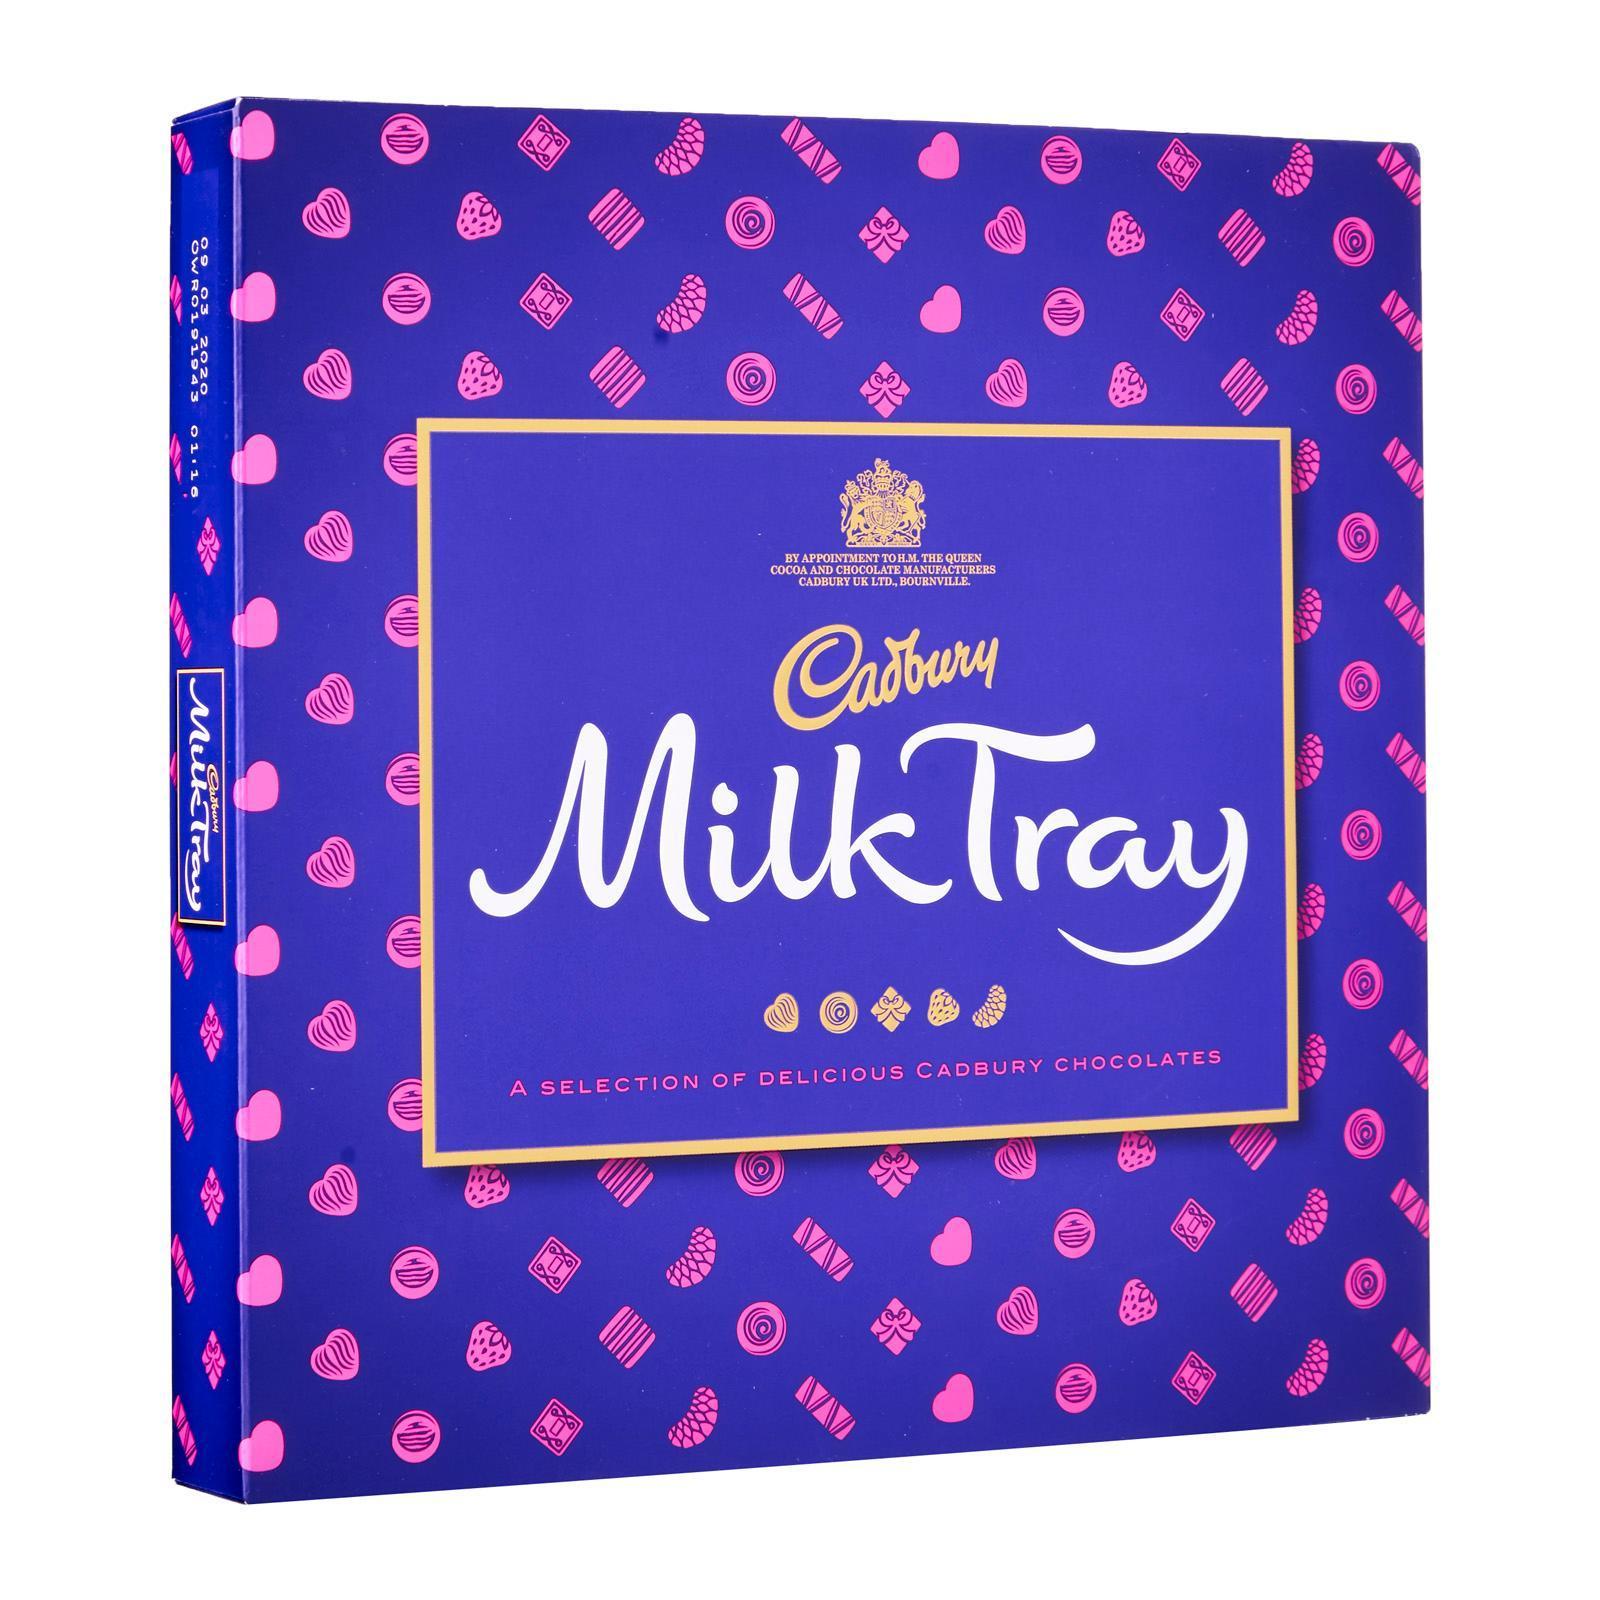 Cadbury Milk Tray Chocolates - Christmas Special